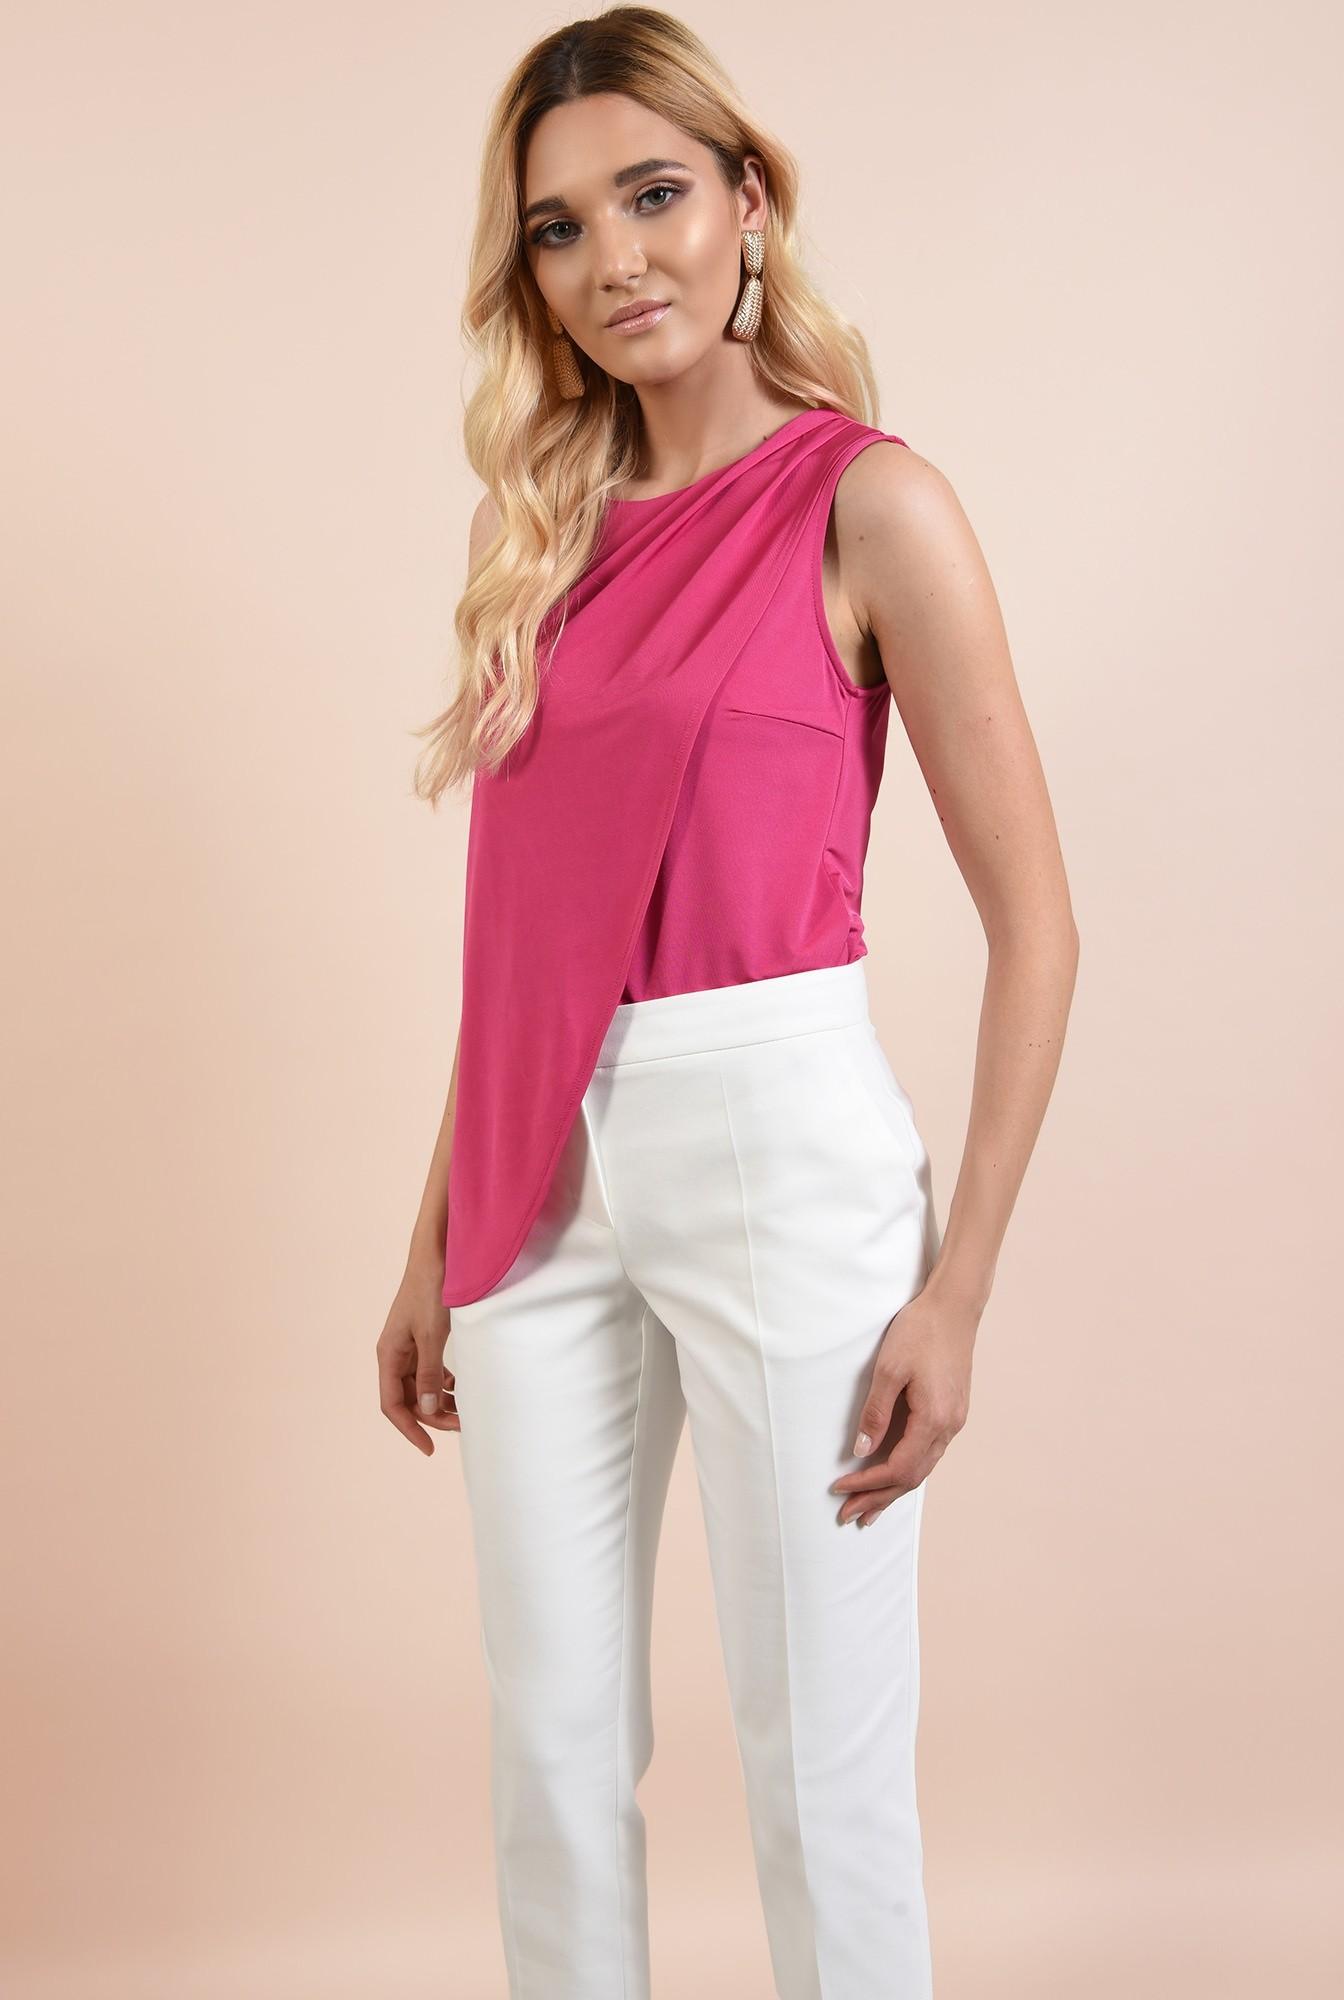 0 - bluza roz, cu fronseuri la umeri, croi parte peste parte, asimetrica